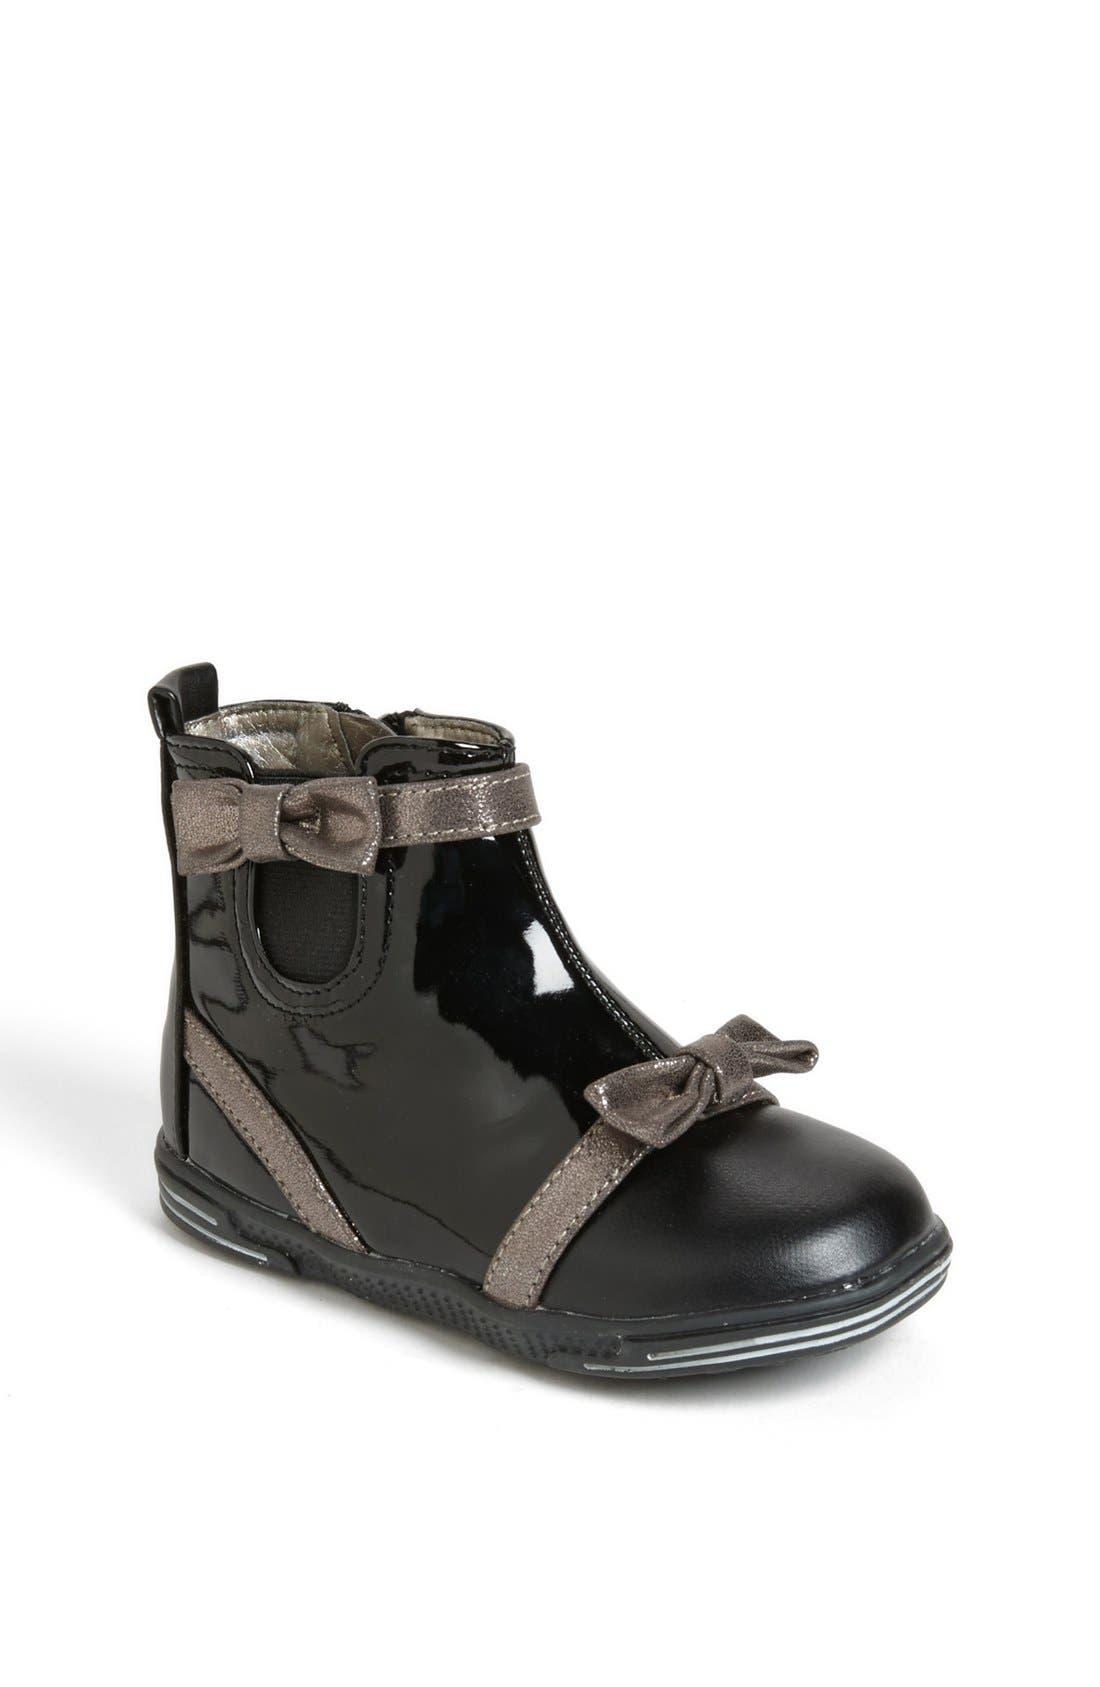 Alternate Image 1 Selected - kensie girl Bow Boot (Walker & Toddler)